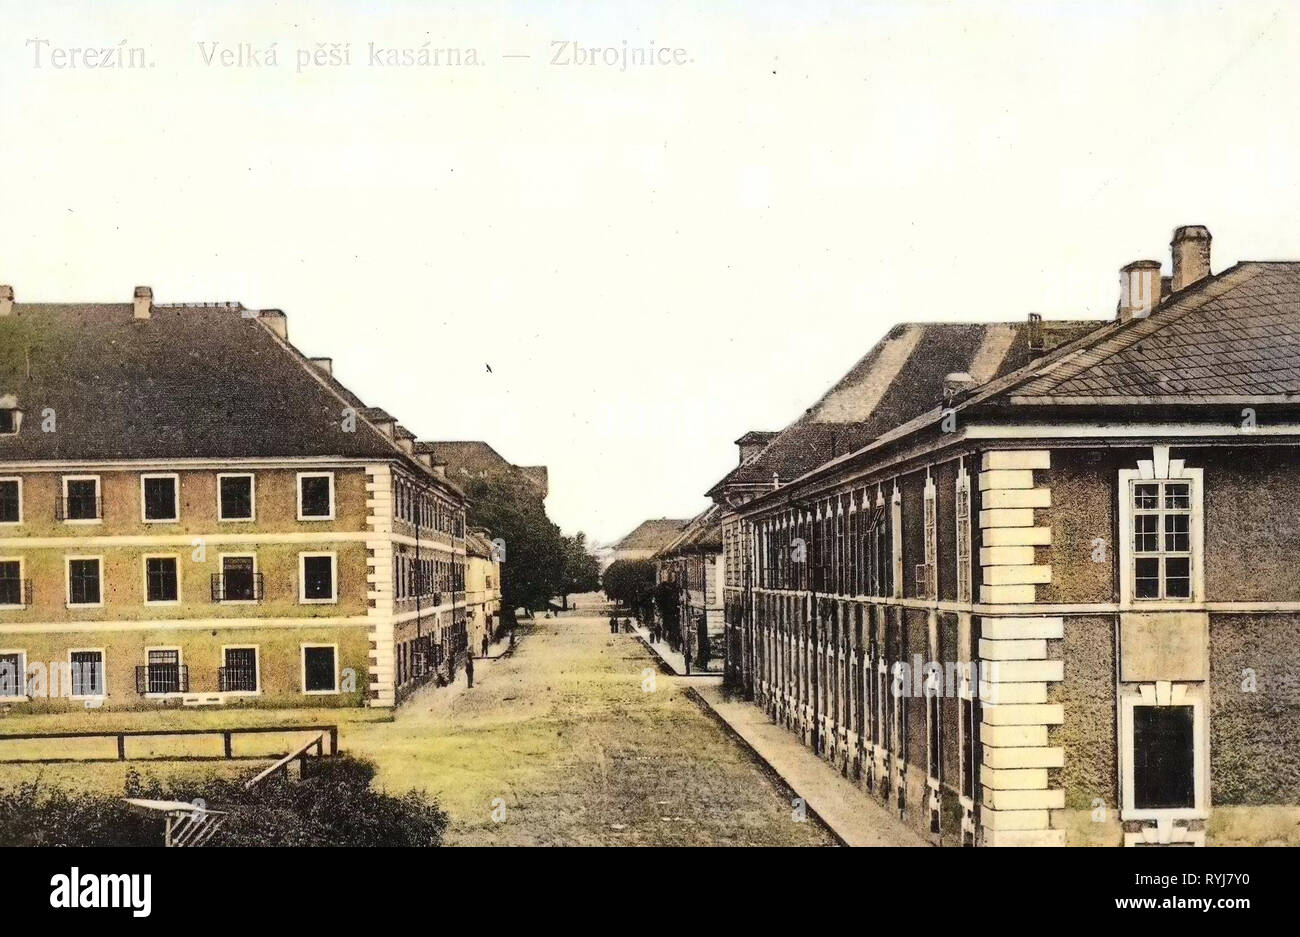 Arsenals in the Czech Republic, Military facilities, 1909, Ústí nad Labem Region, Theresienstadt, Große Infanteriekaserne, Zeughaus - Stock Image